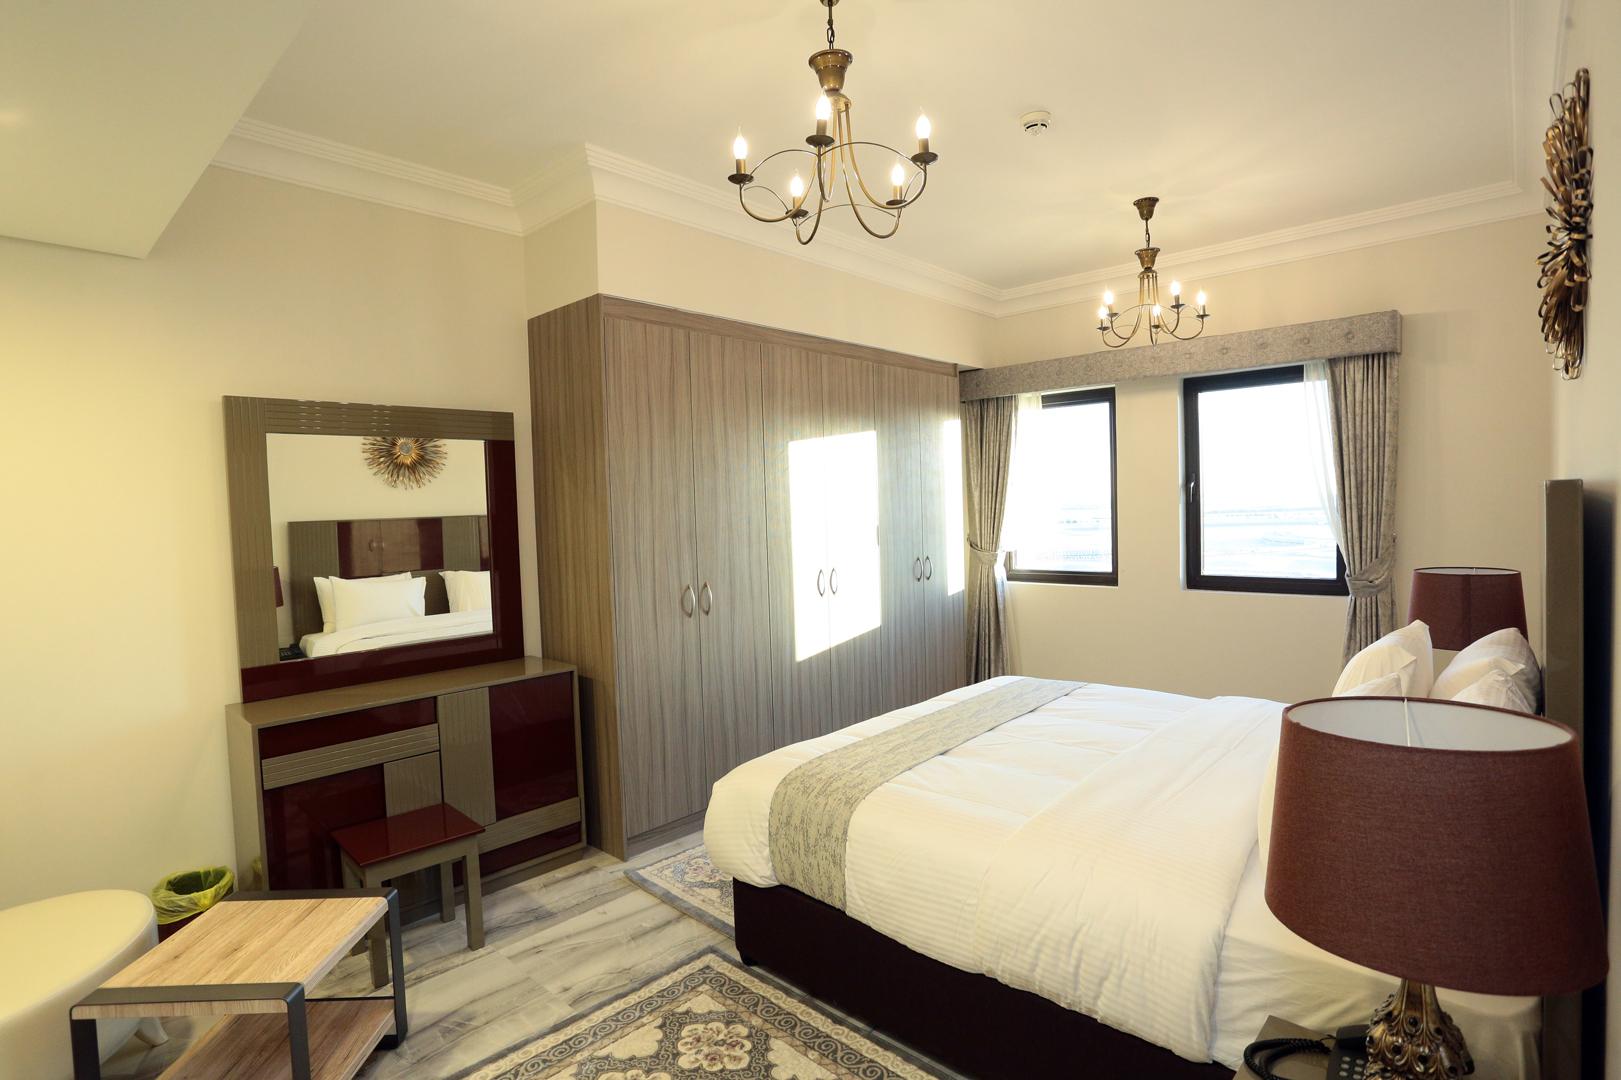 Apartment Marbella Luxury 2 bedrooms photo 27263076